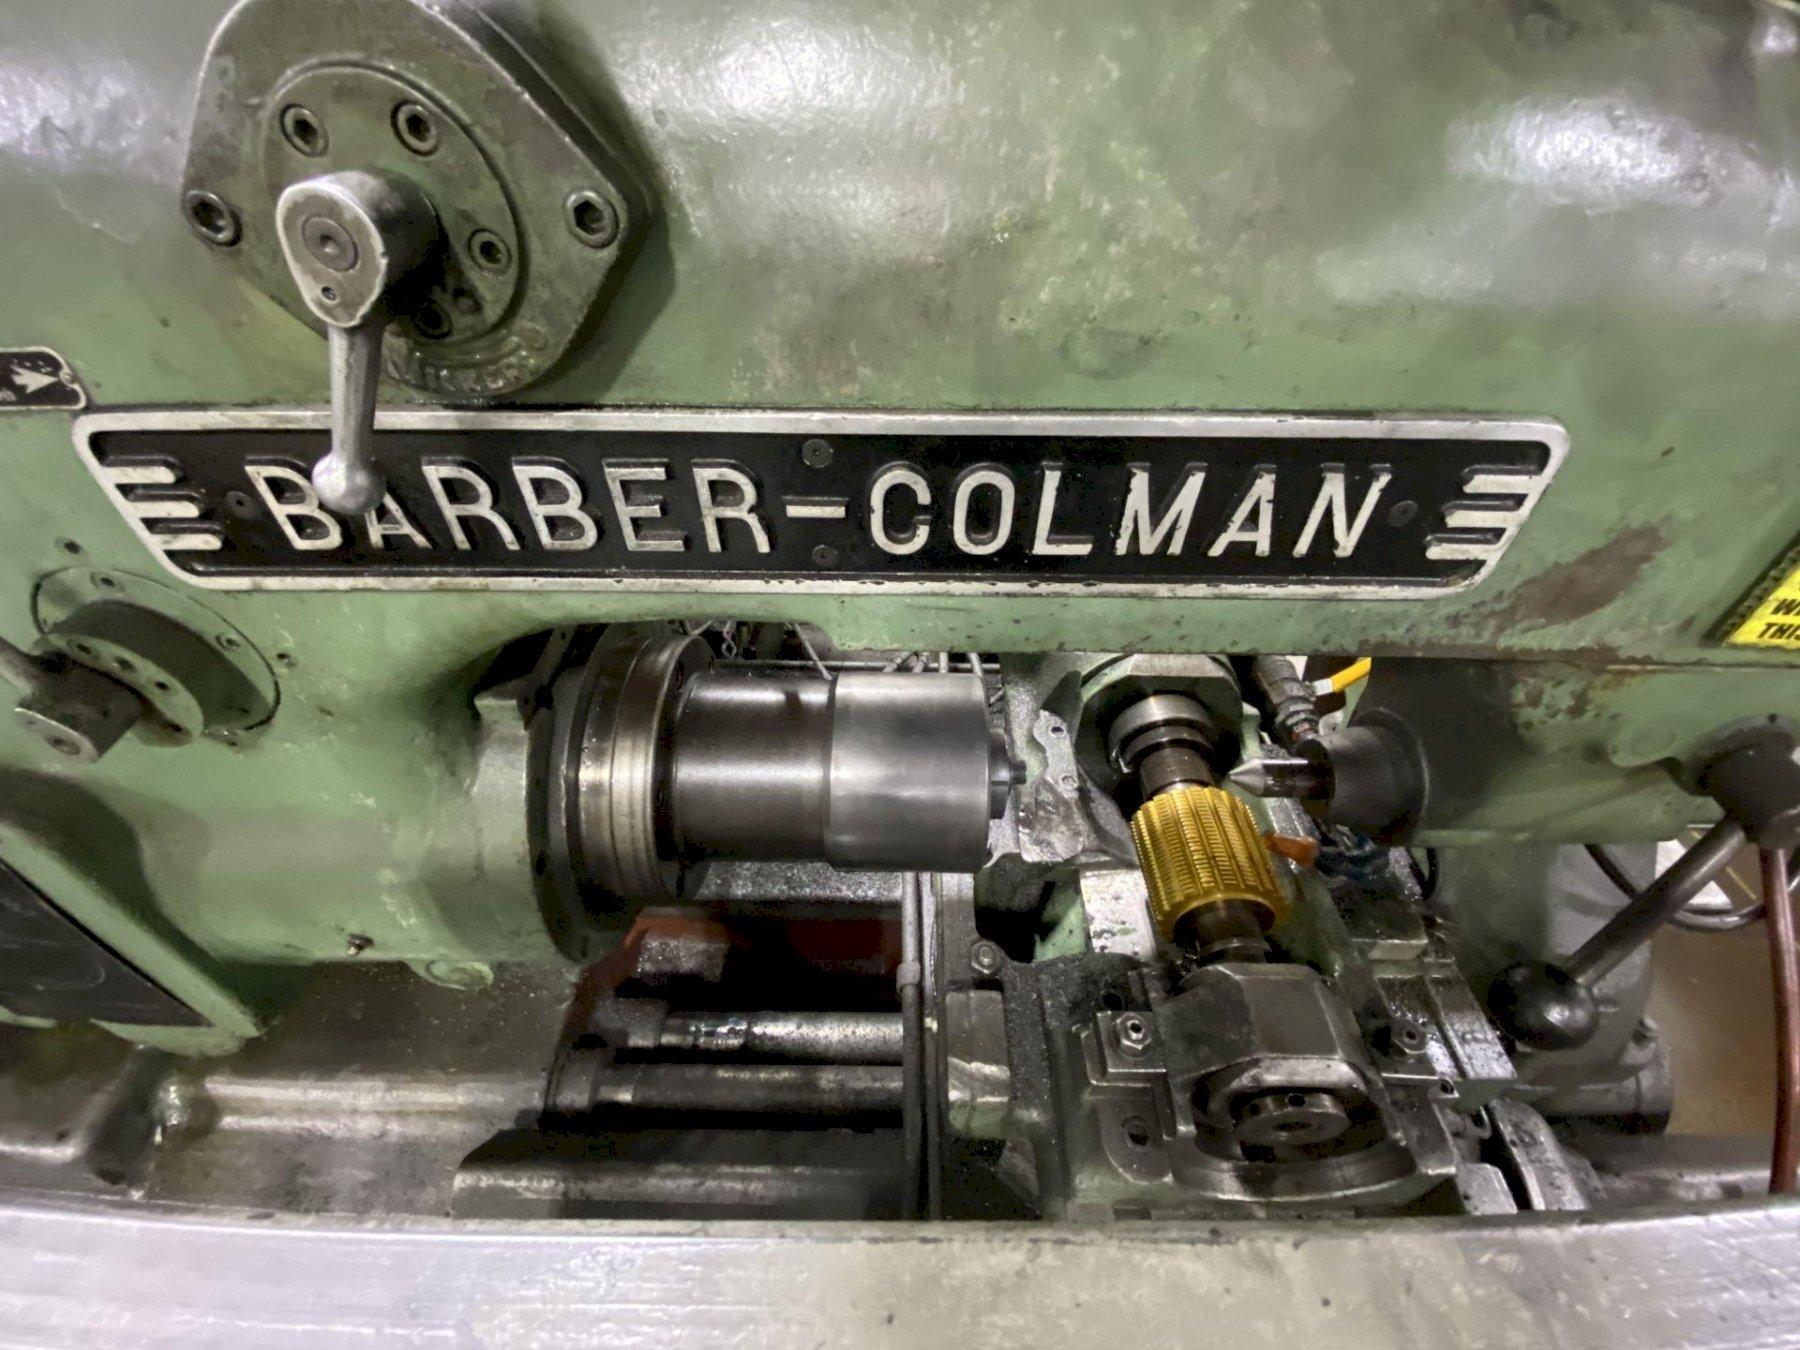 "14-15 BARBER COLMAN HORIZONTAL GEAR HOBBER, 14"" Max Work Diameter, 15"" Max Hob Slide Travel, 6.25"" Max Hob Diameter, Auto Hob Shift, Auto 2-Cut Cycle, Hydraulic Workhead, Hydraulic & Coolant System, New 1967."